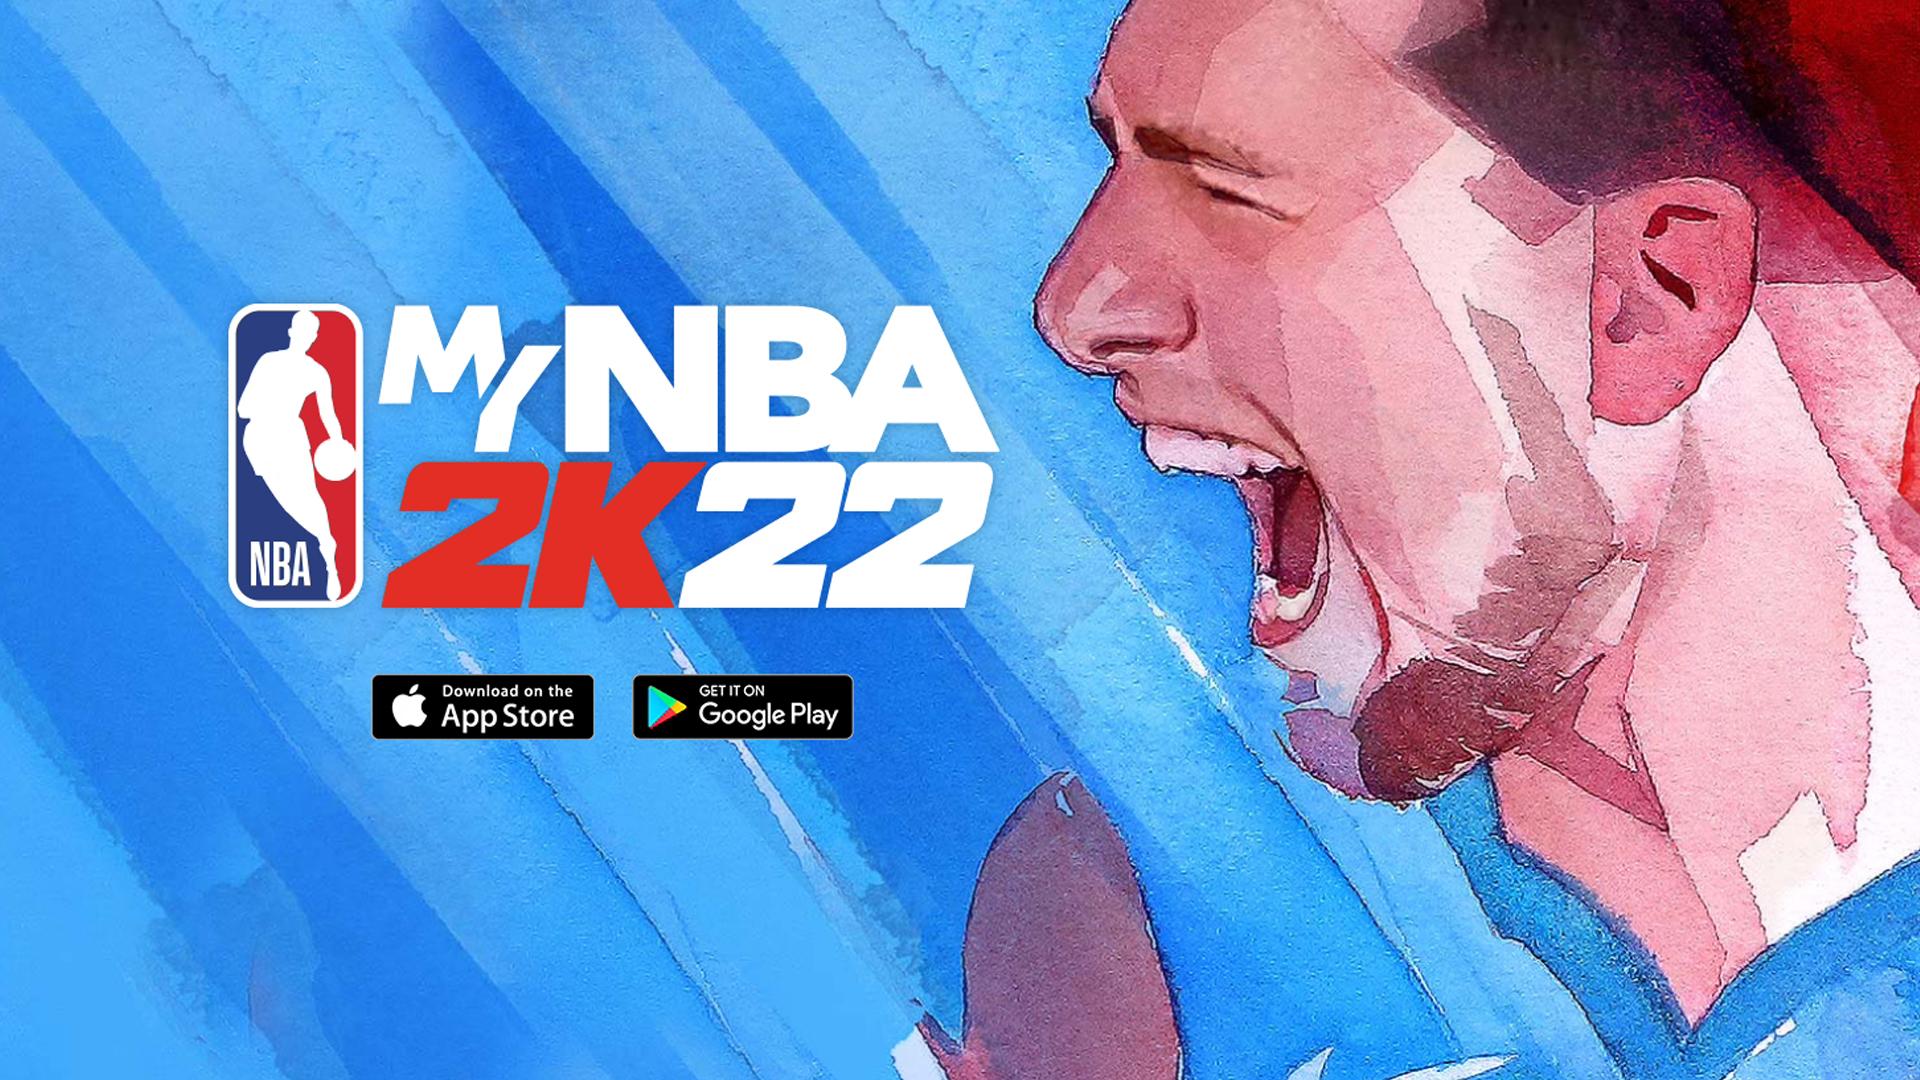 vignette-nba-2k22-mynba-app